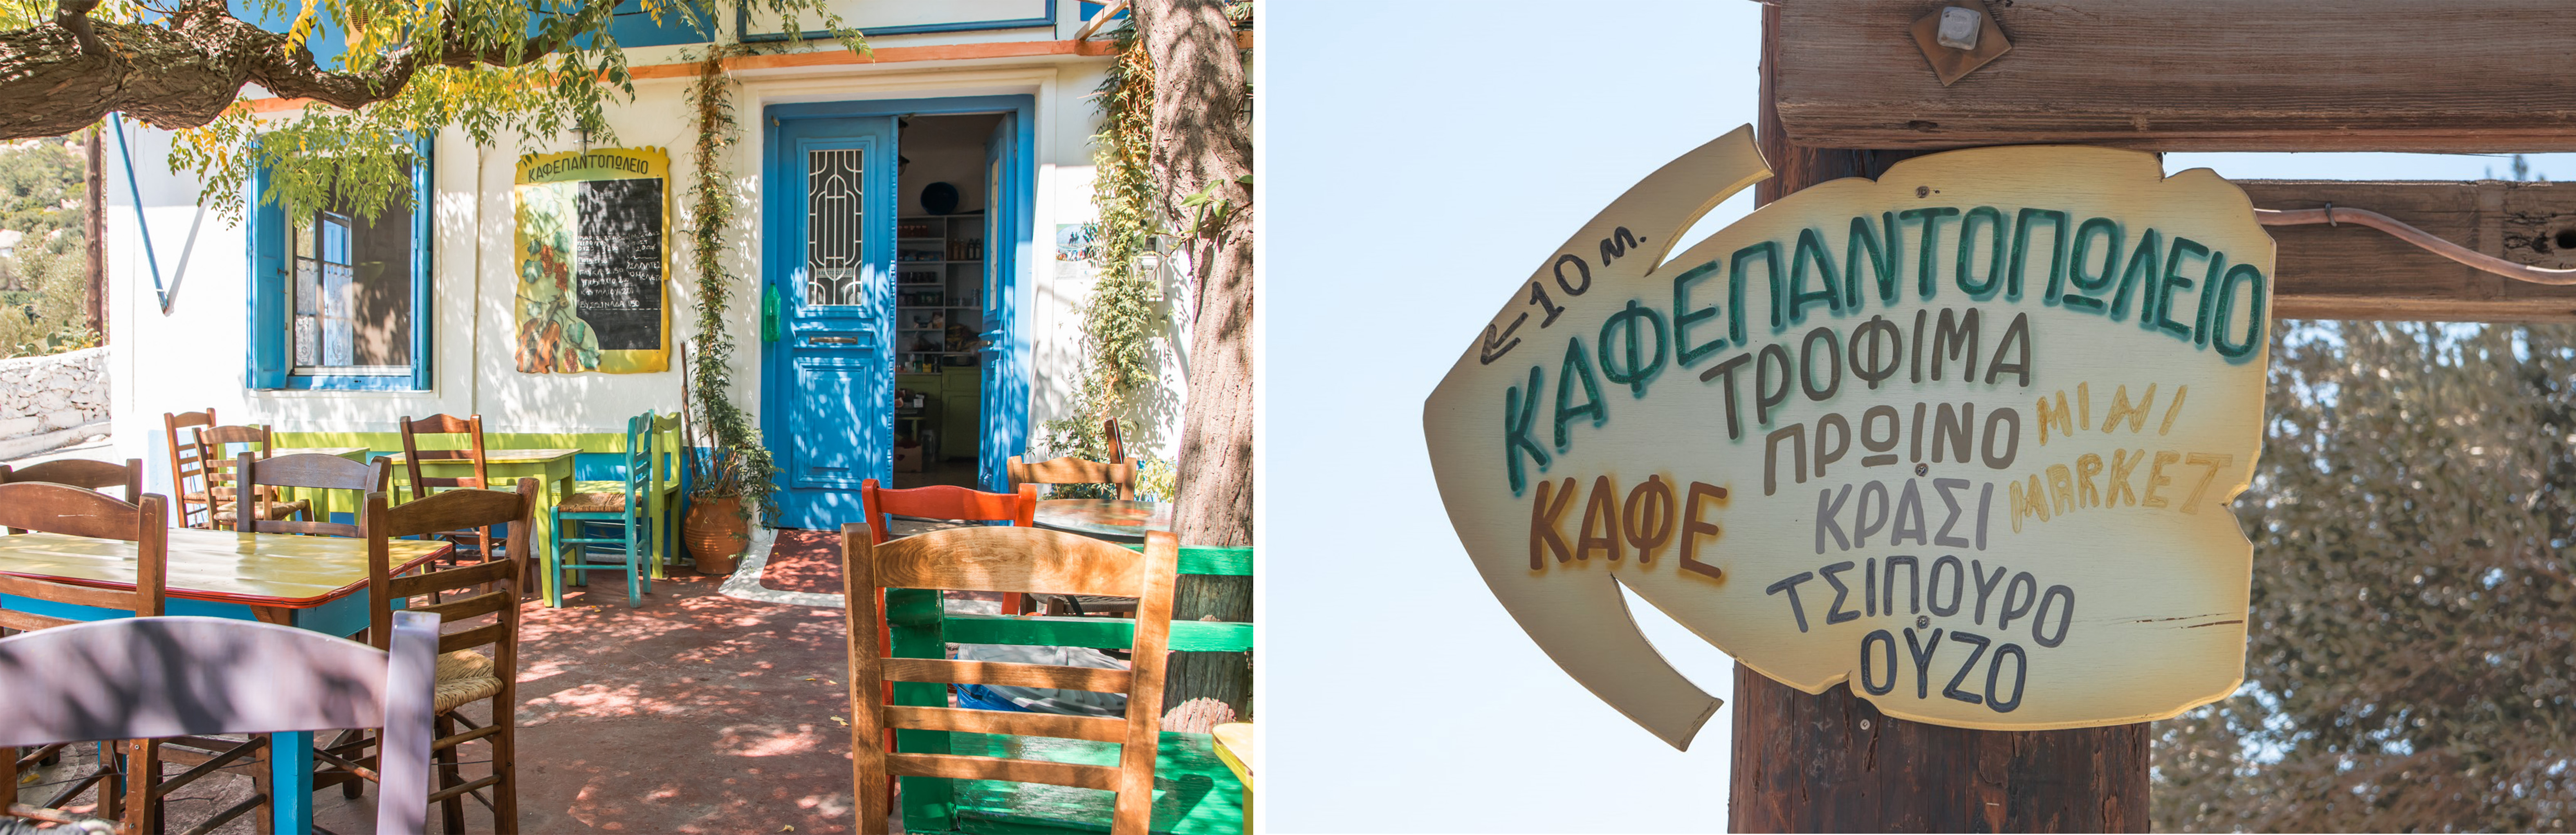 Gemeimtipp - das Kafepantopolio in Magganitis